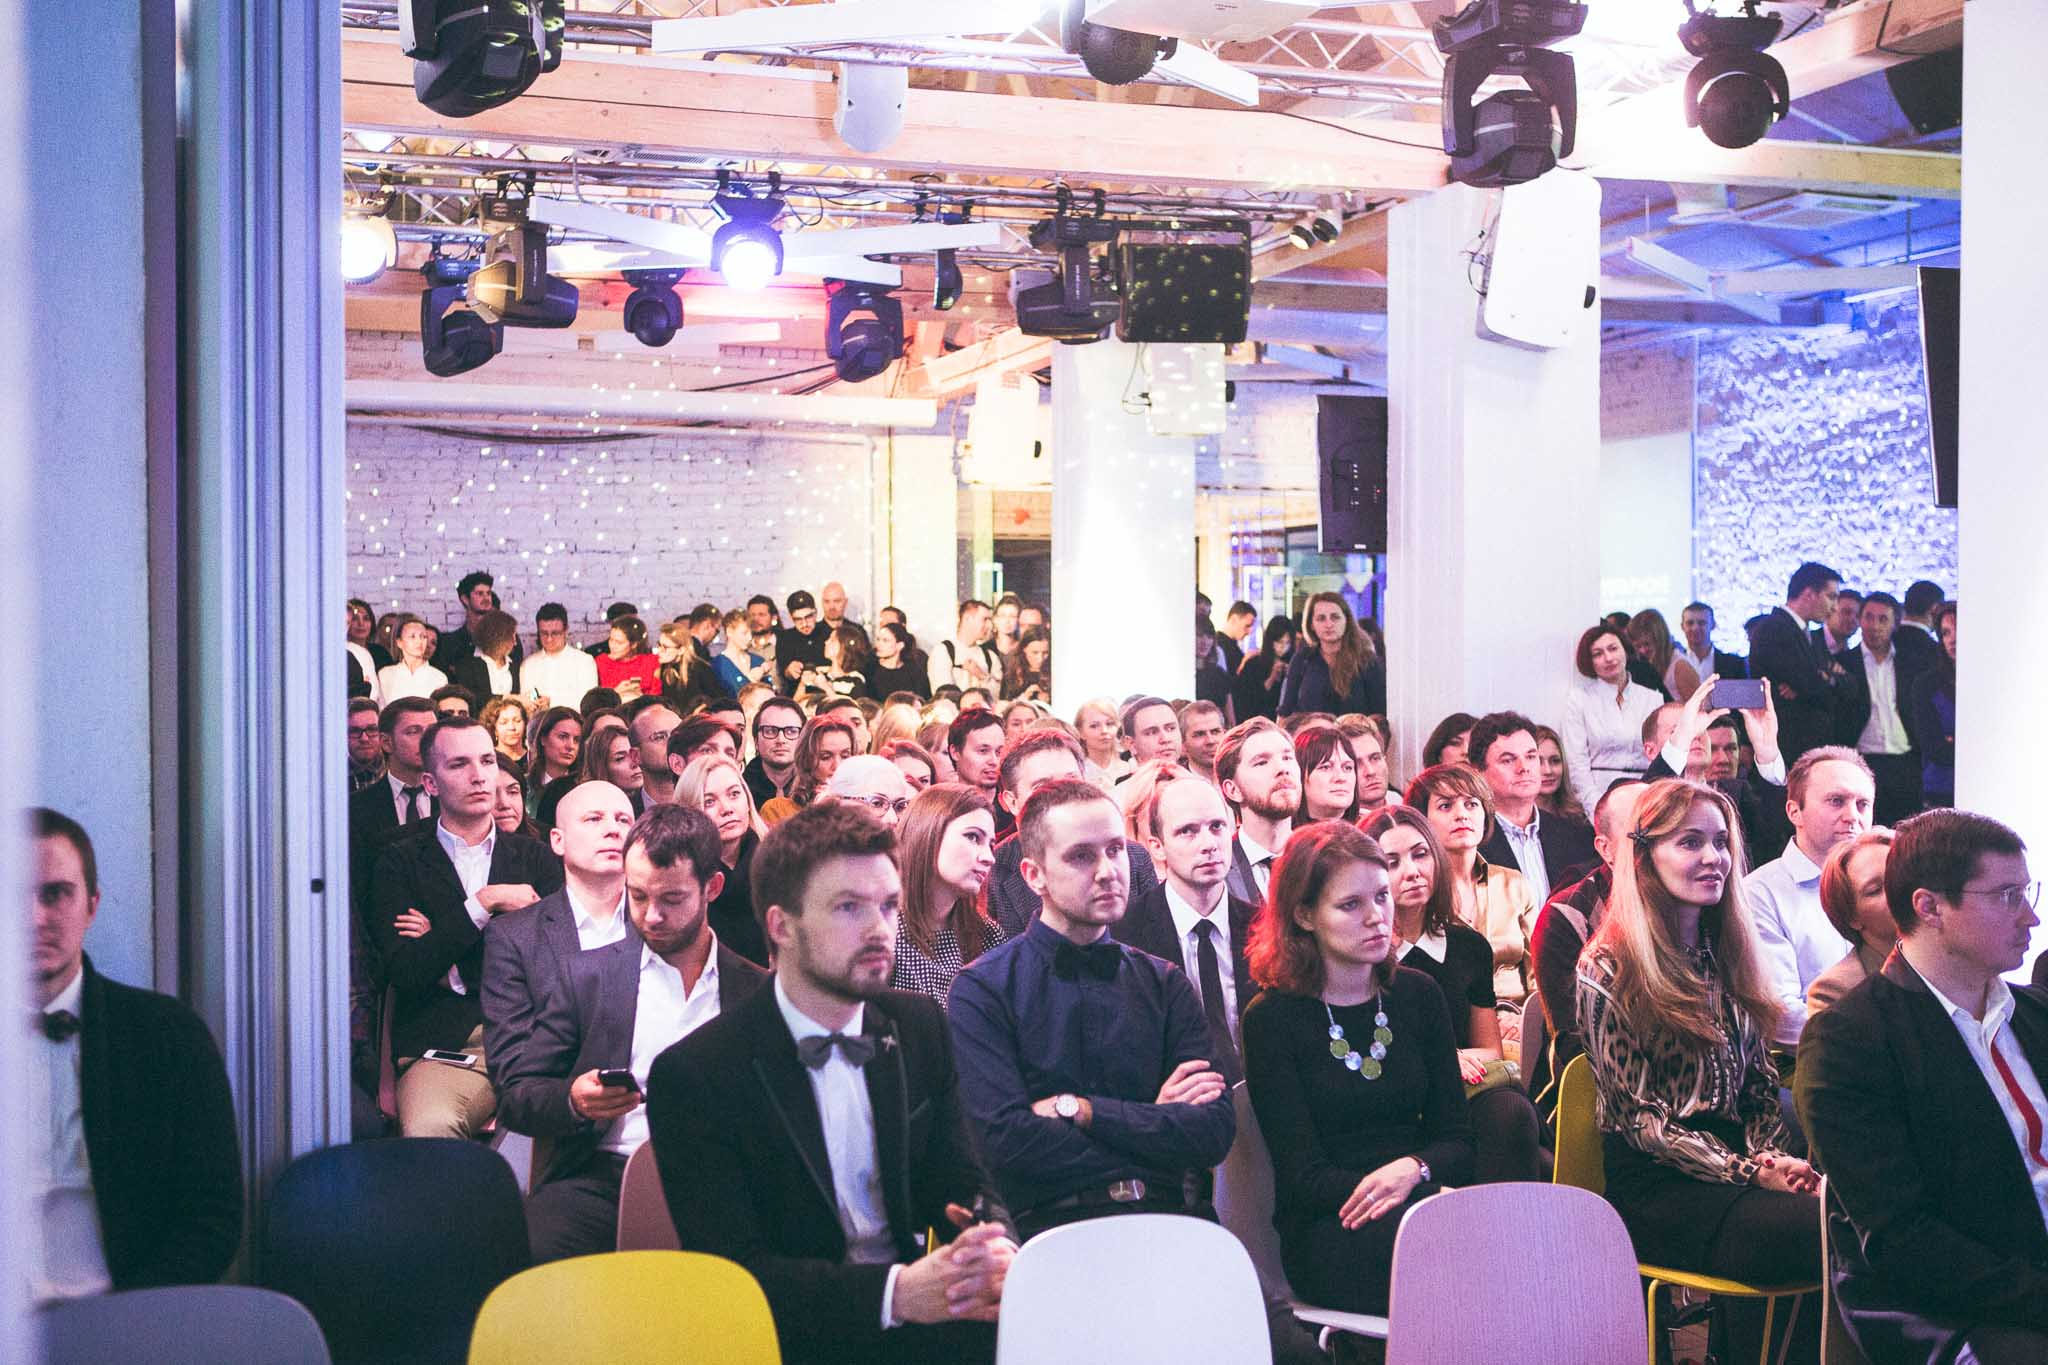 yp_20141202_212904_презентация_Event_yota_yotaphone_Urban_moscow